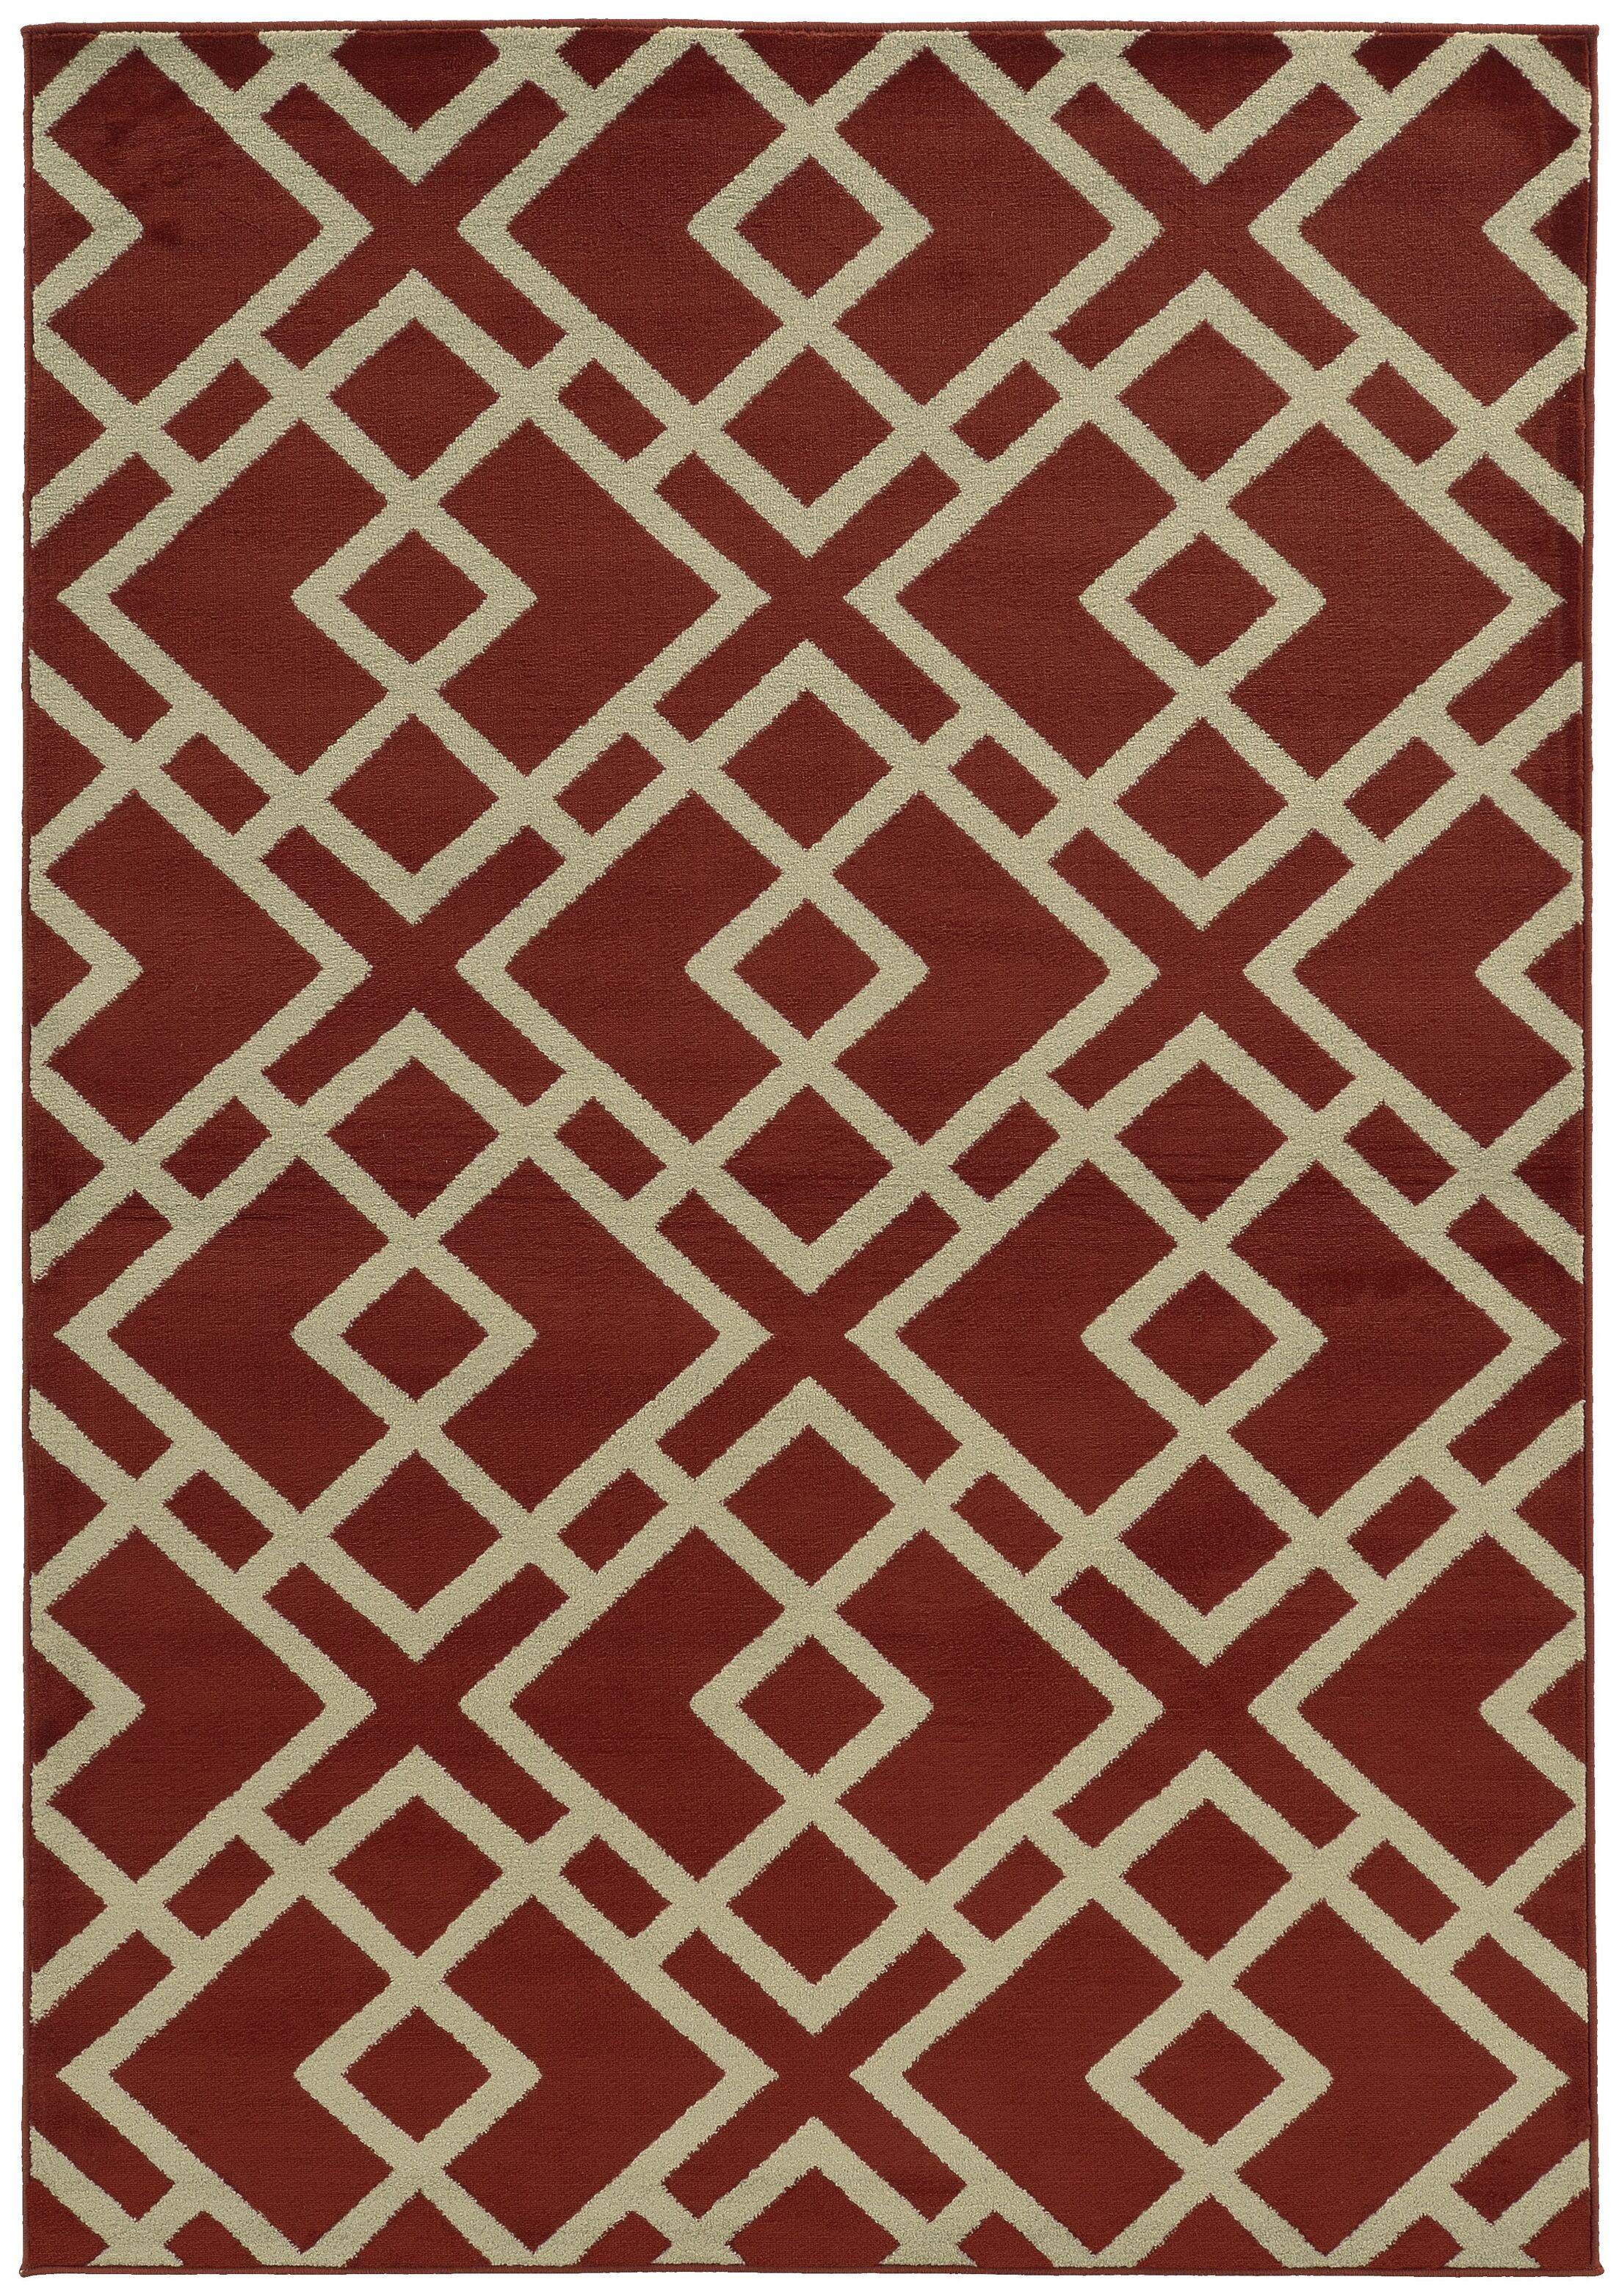 Halloran Red/Light Grey Area Rug Rug Size: Runner 1'1 x 7'6